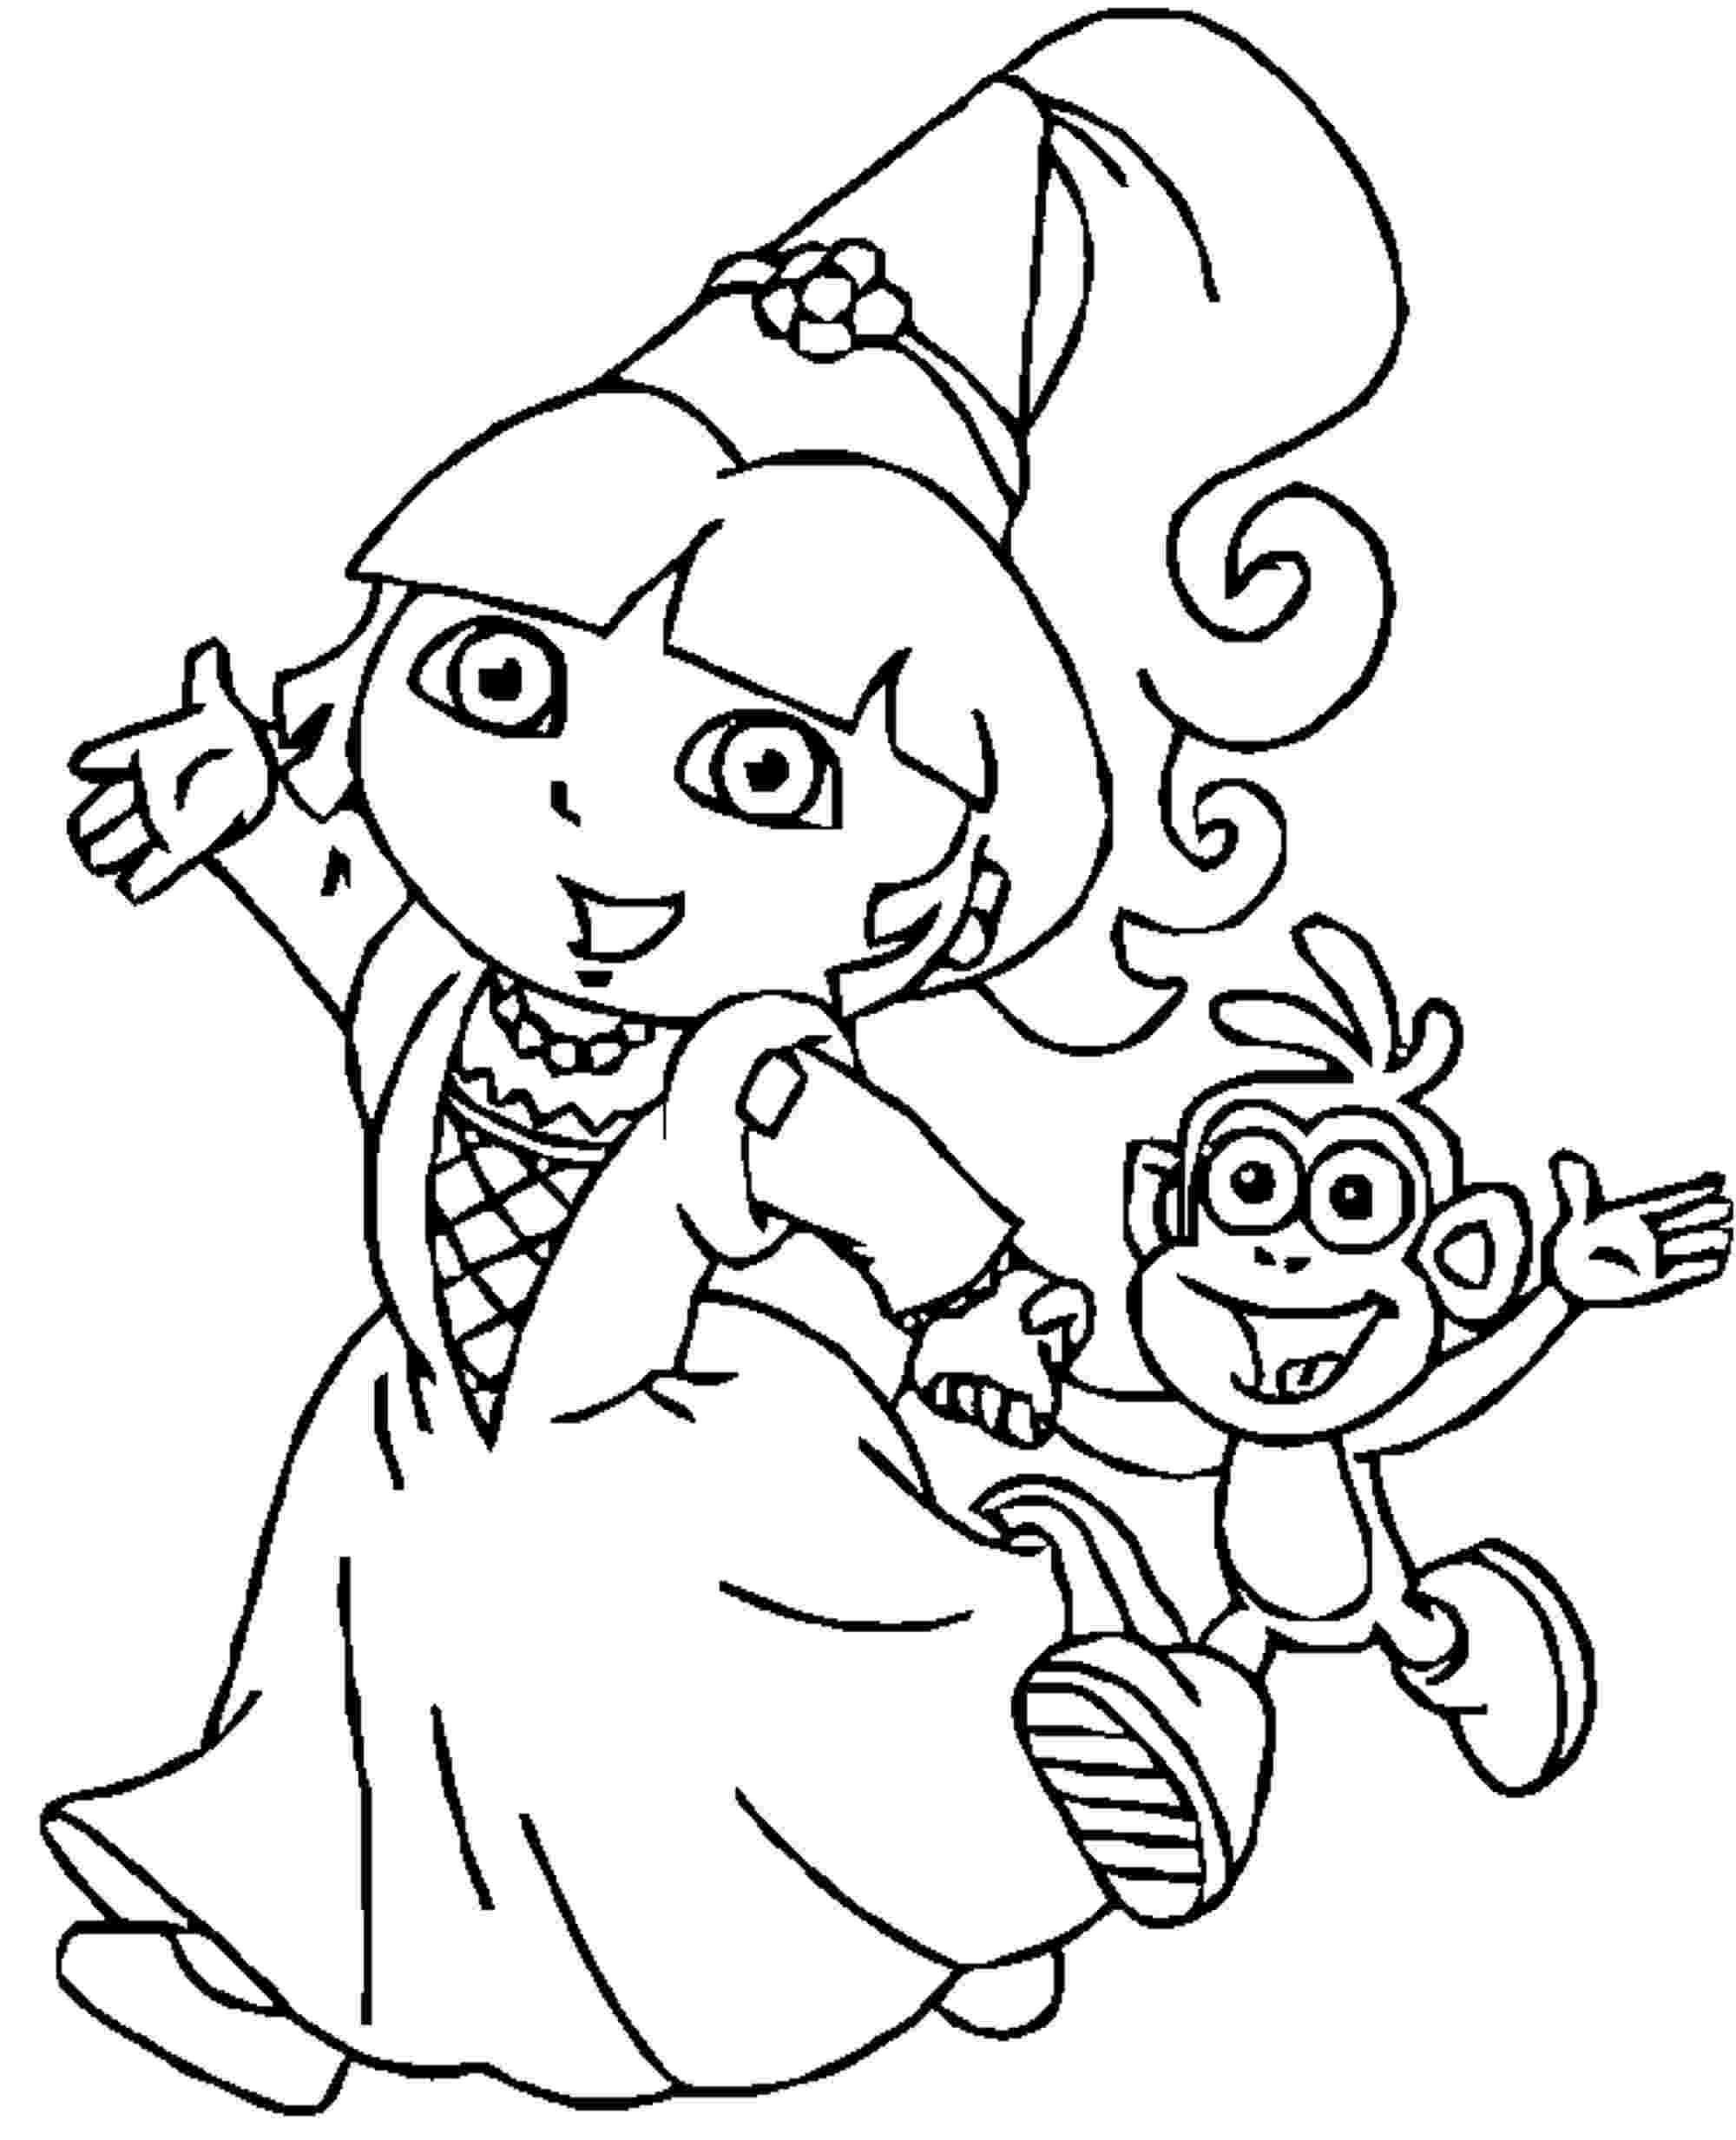 dora free dora halloween coloring pages dora and boots halloween free dora